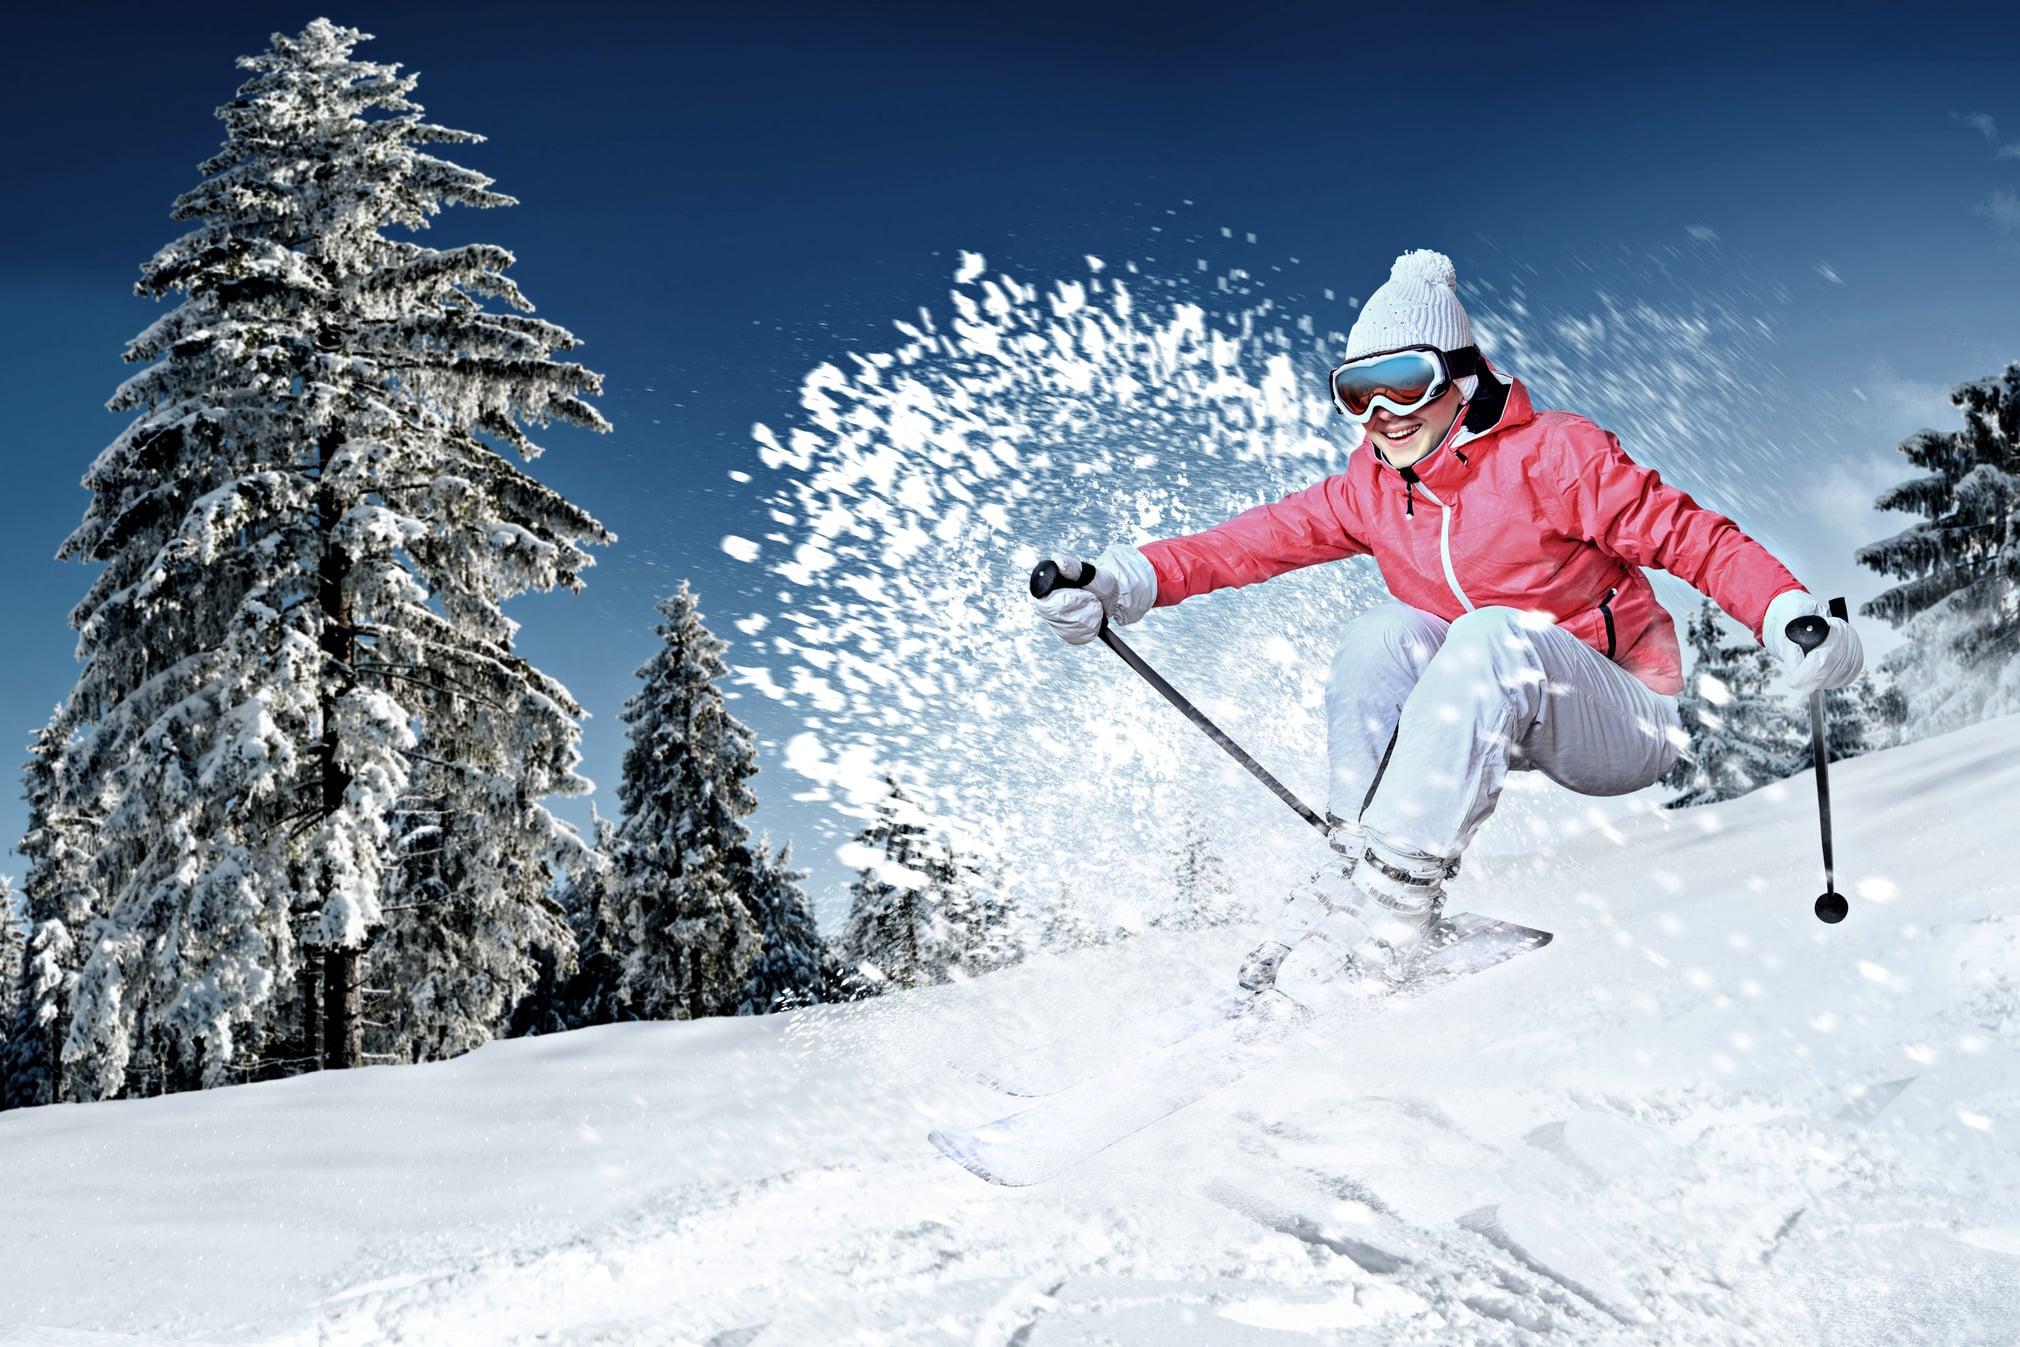 Skieur prenant du plaisir